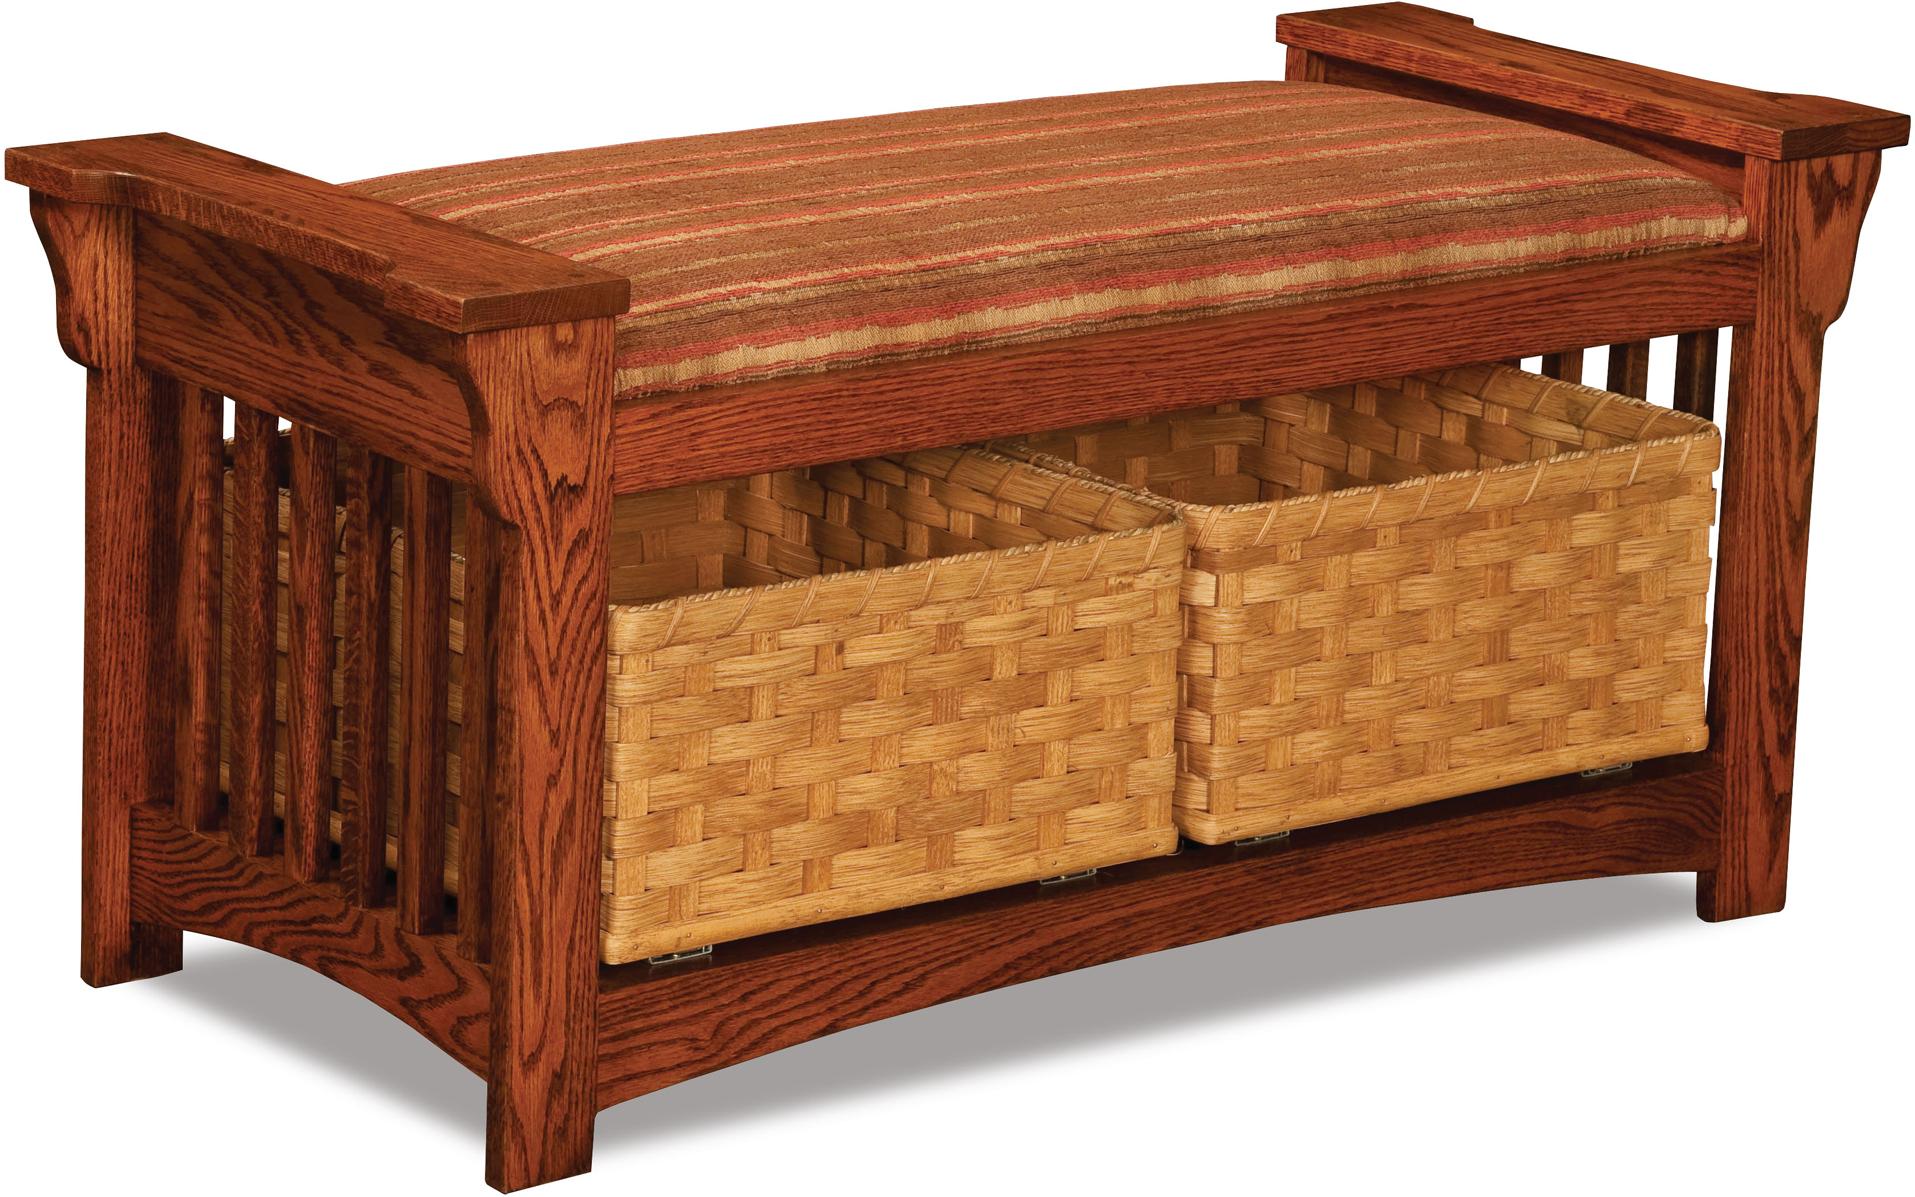 Mission Slat Wood Bench With Baskets Custom Amish Furniture